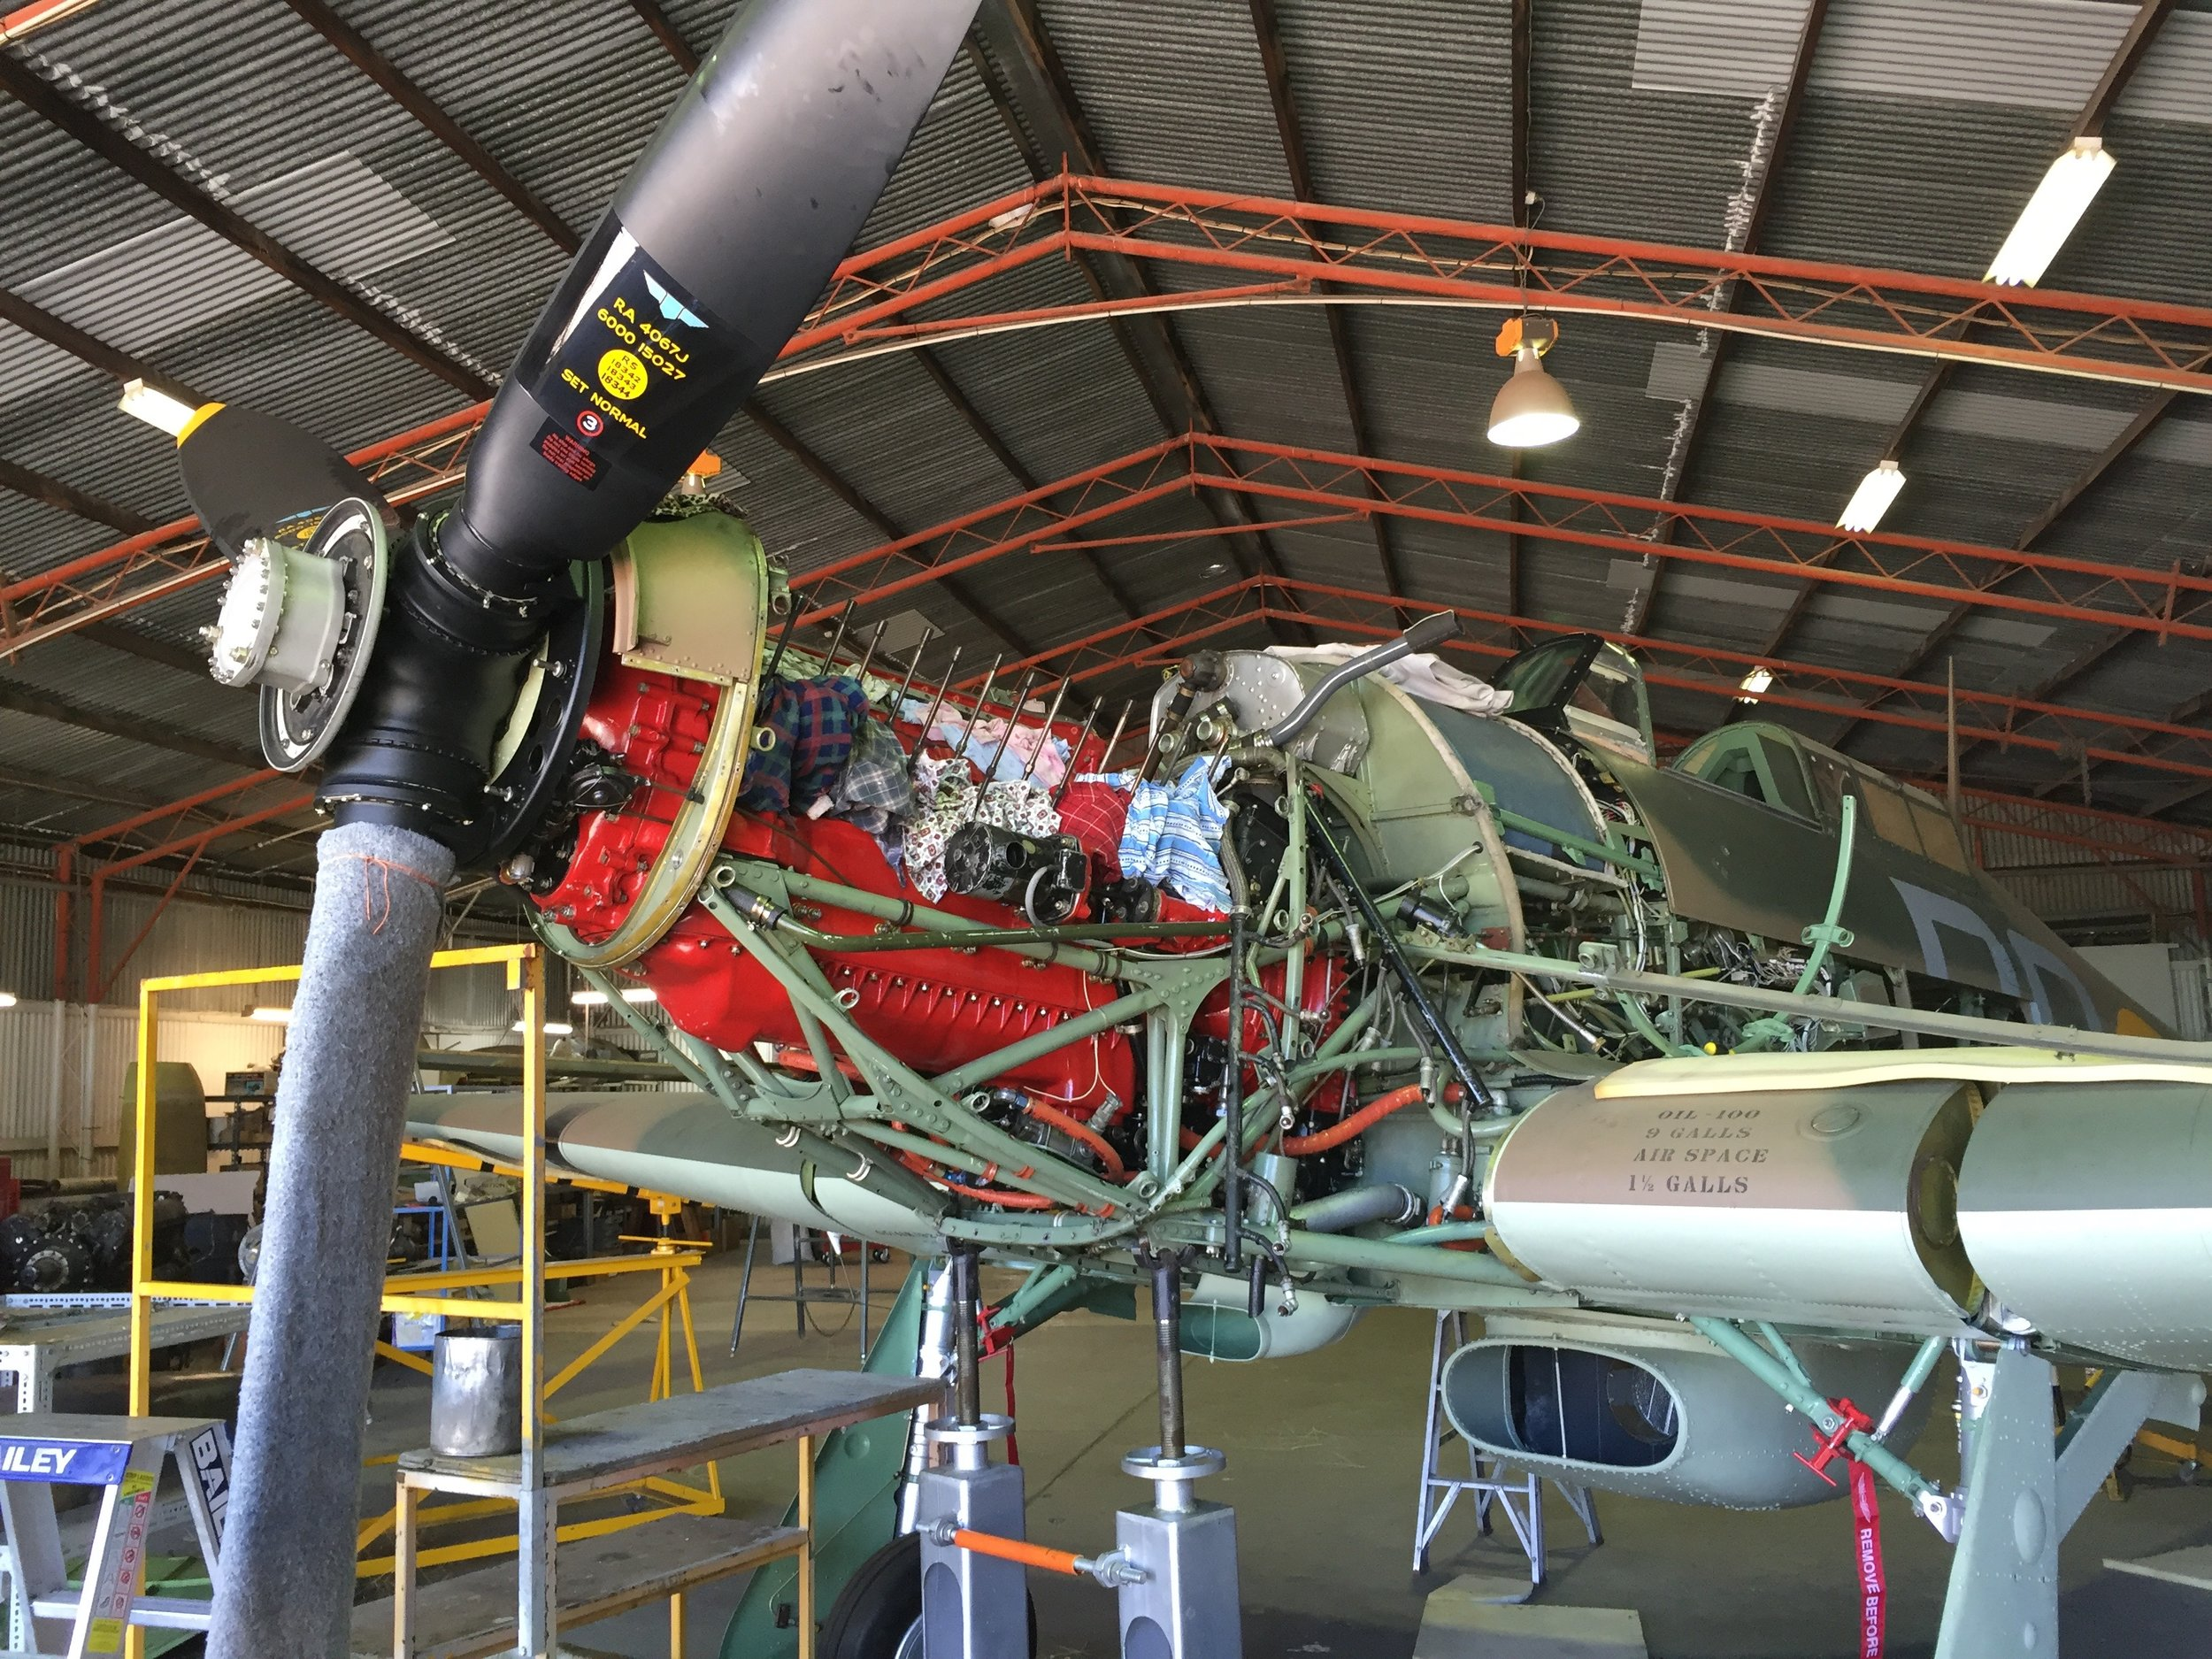 Merlin 500-45 undergoing service